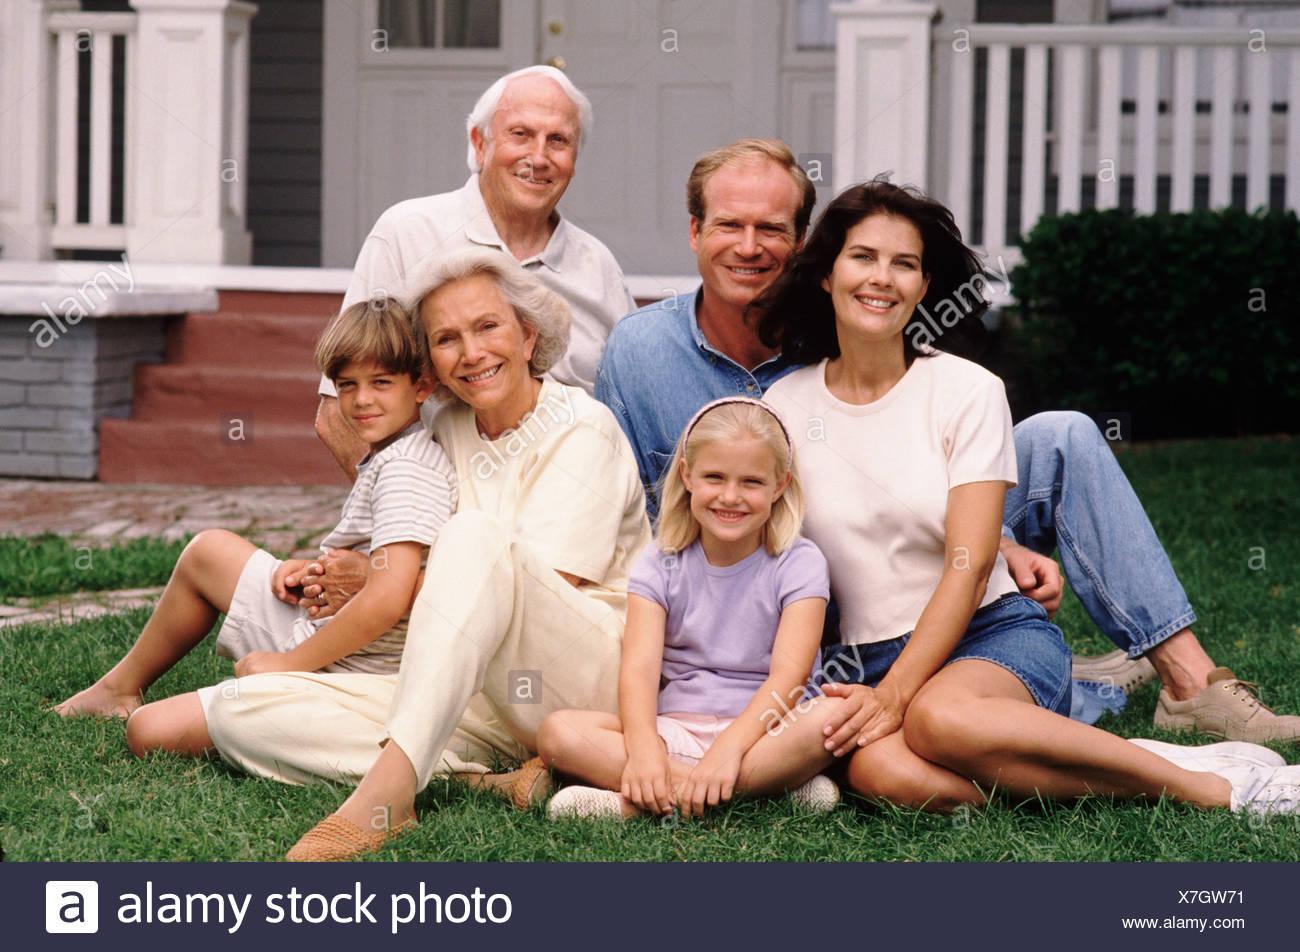 Family portrait - Stock Image